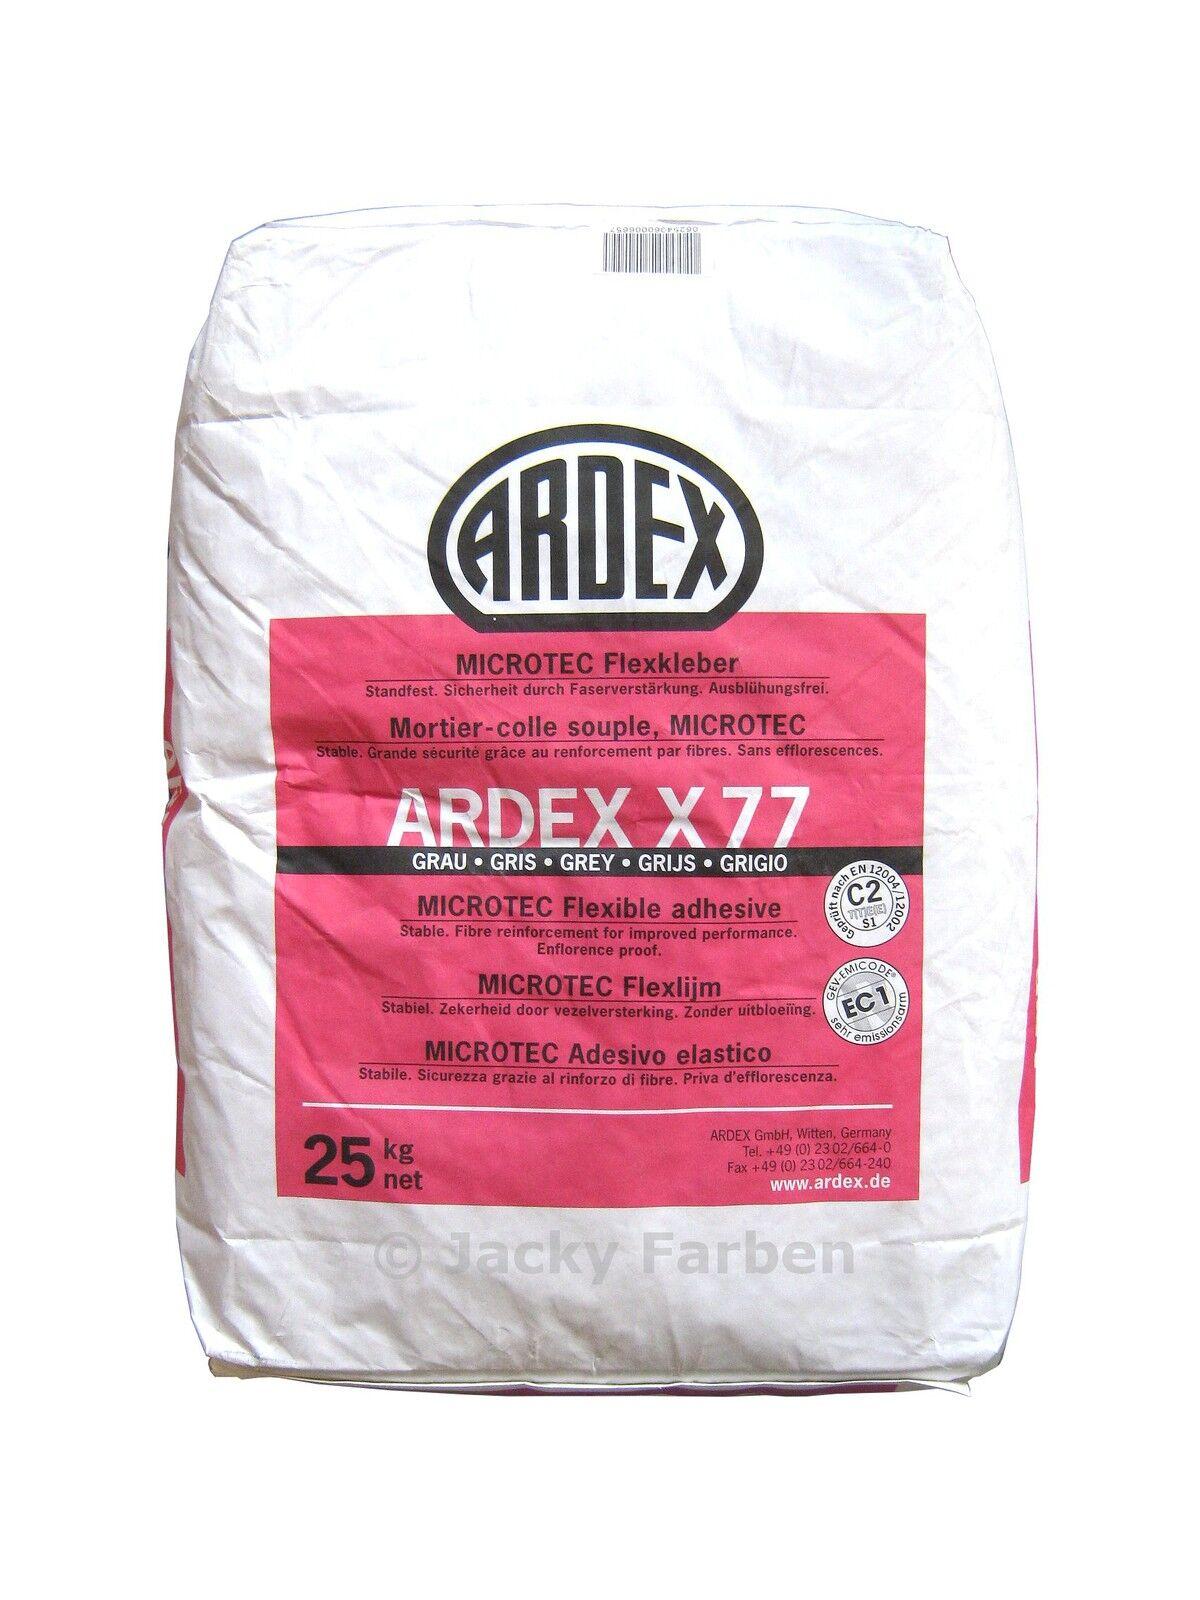 Ardex X77 Fliesenkleber Flexmörtel 25kg faserverstärkt MICROTEC